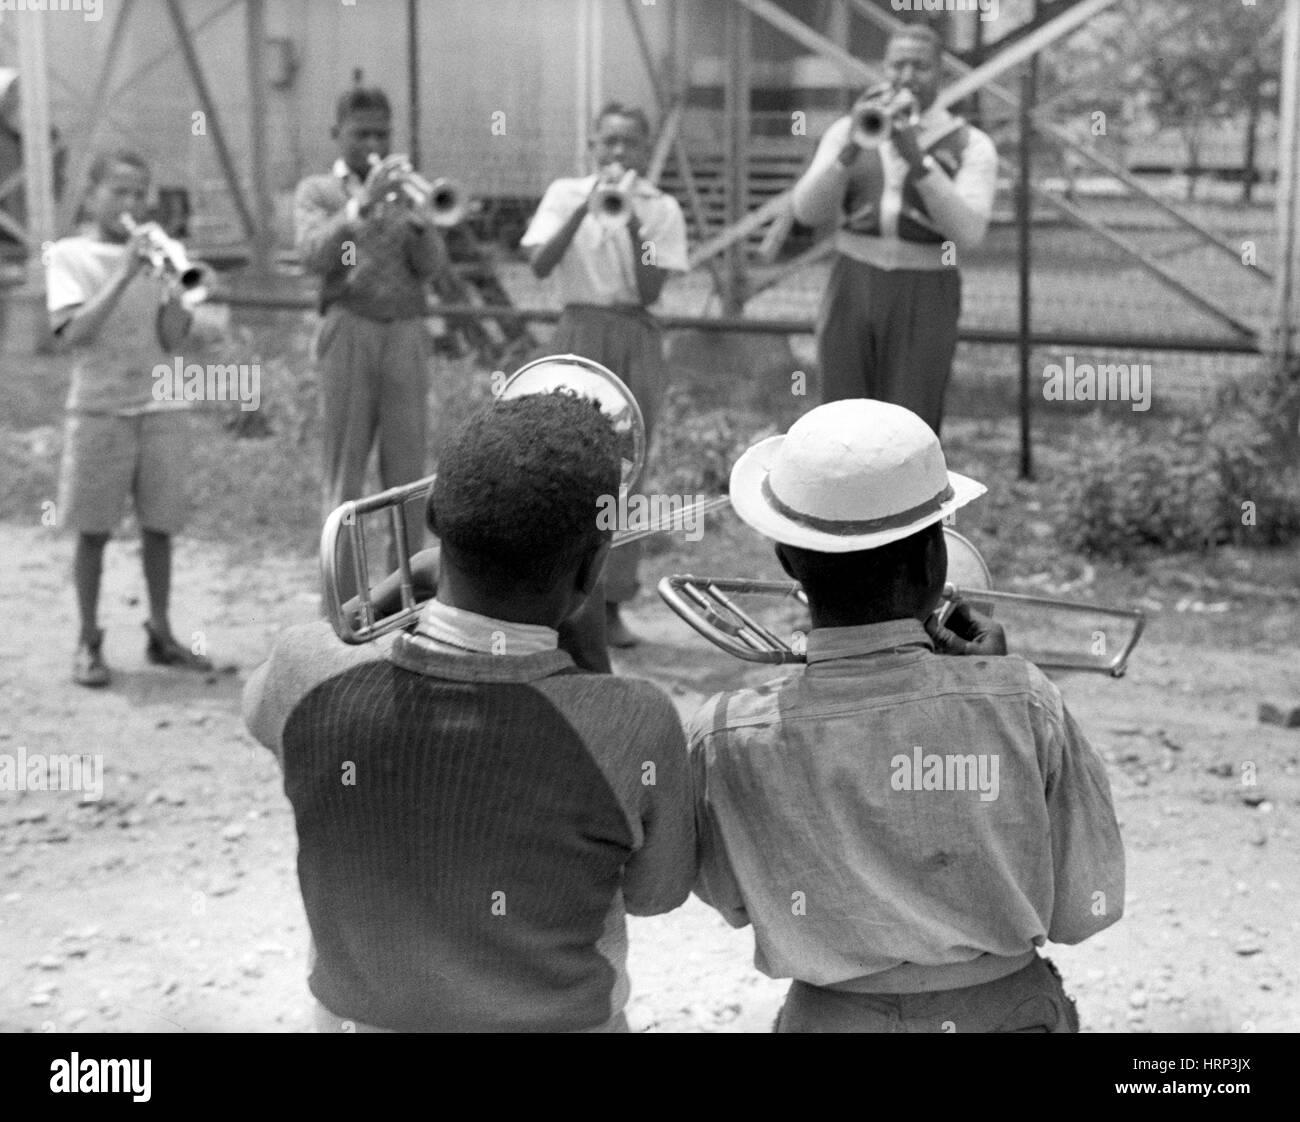 High School Band Practice, 1940 - Stock Image